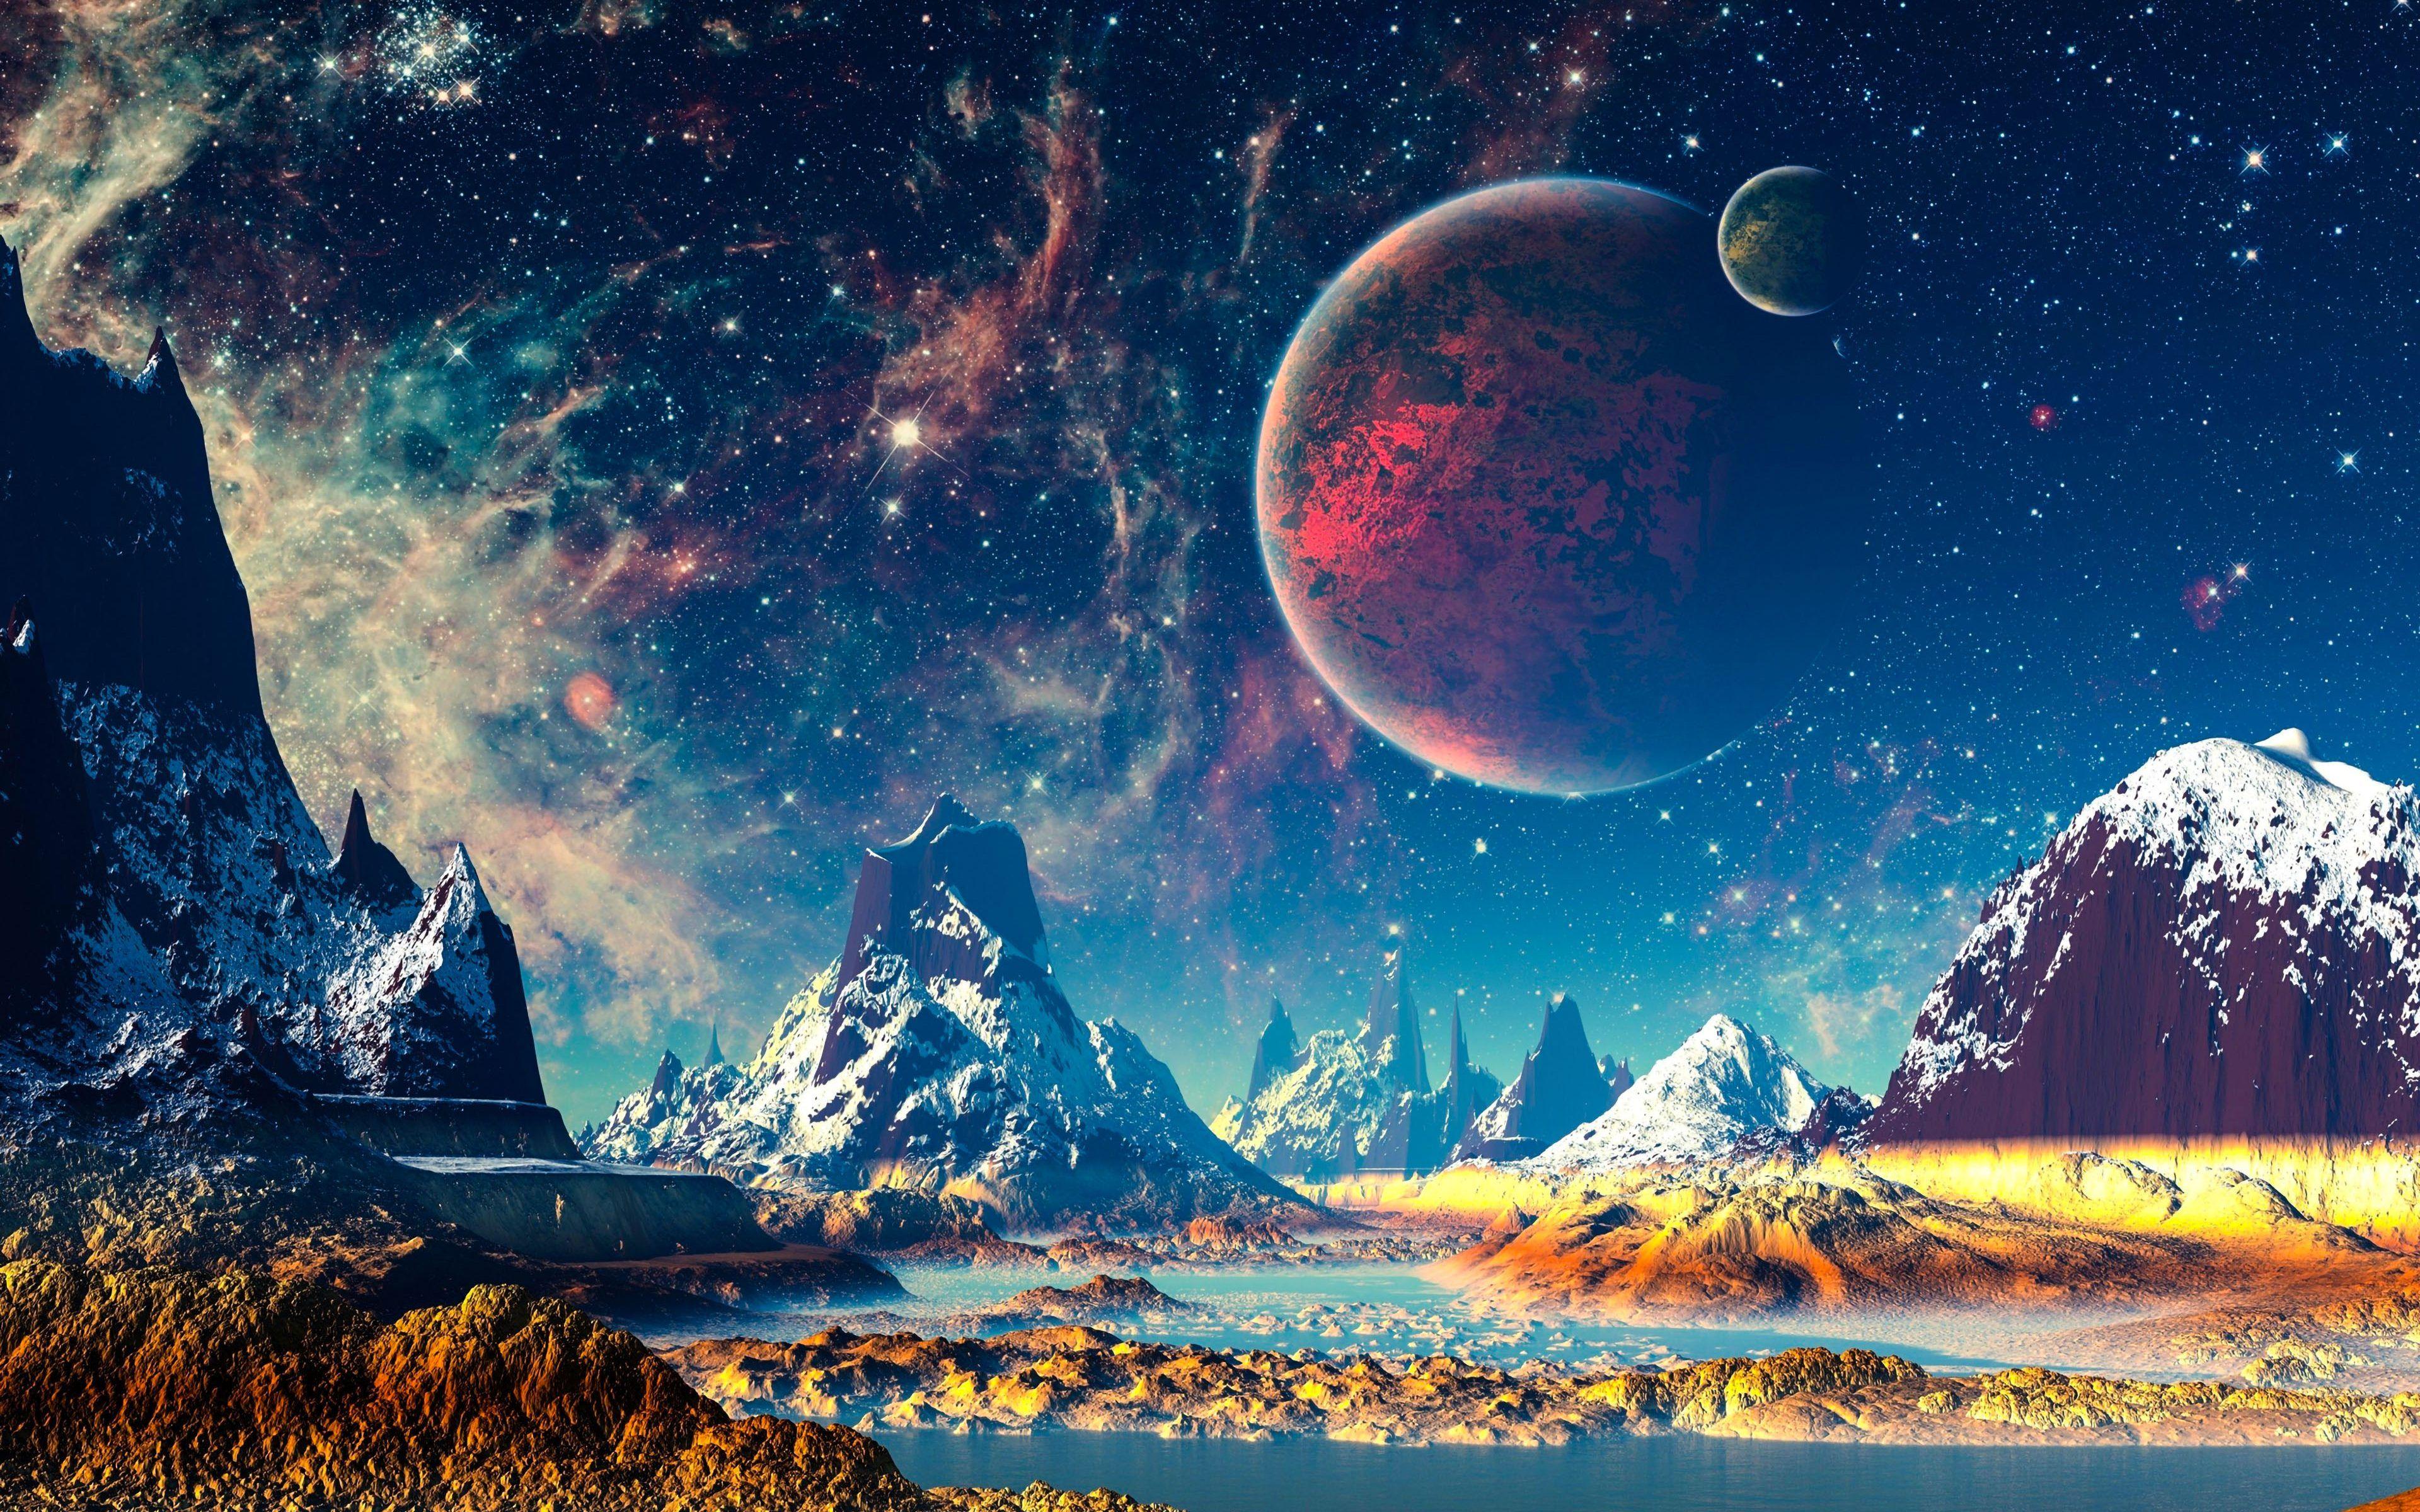 A Super Detailed Fantasy World 4k Wallpaper In 2020 Landscape Wallpaper Fantasy Landscape Digital Wallpaper